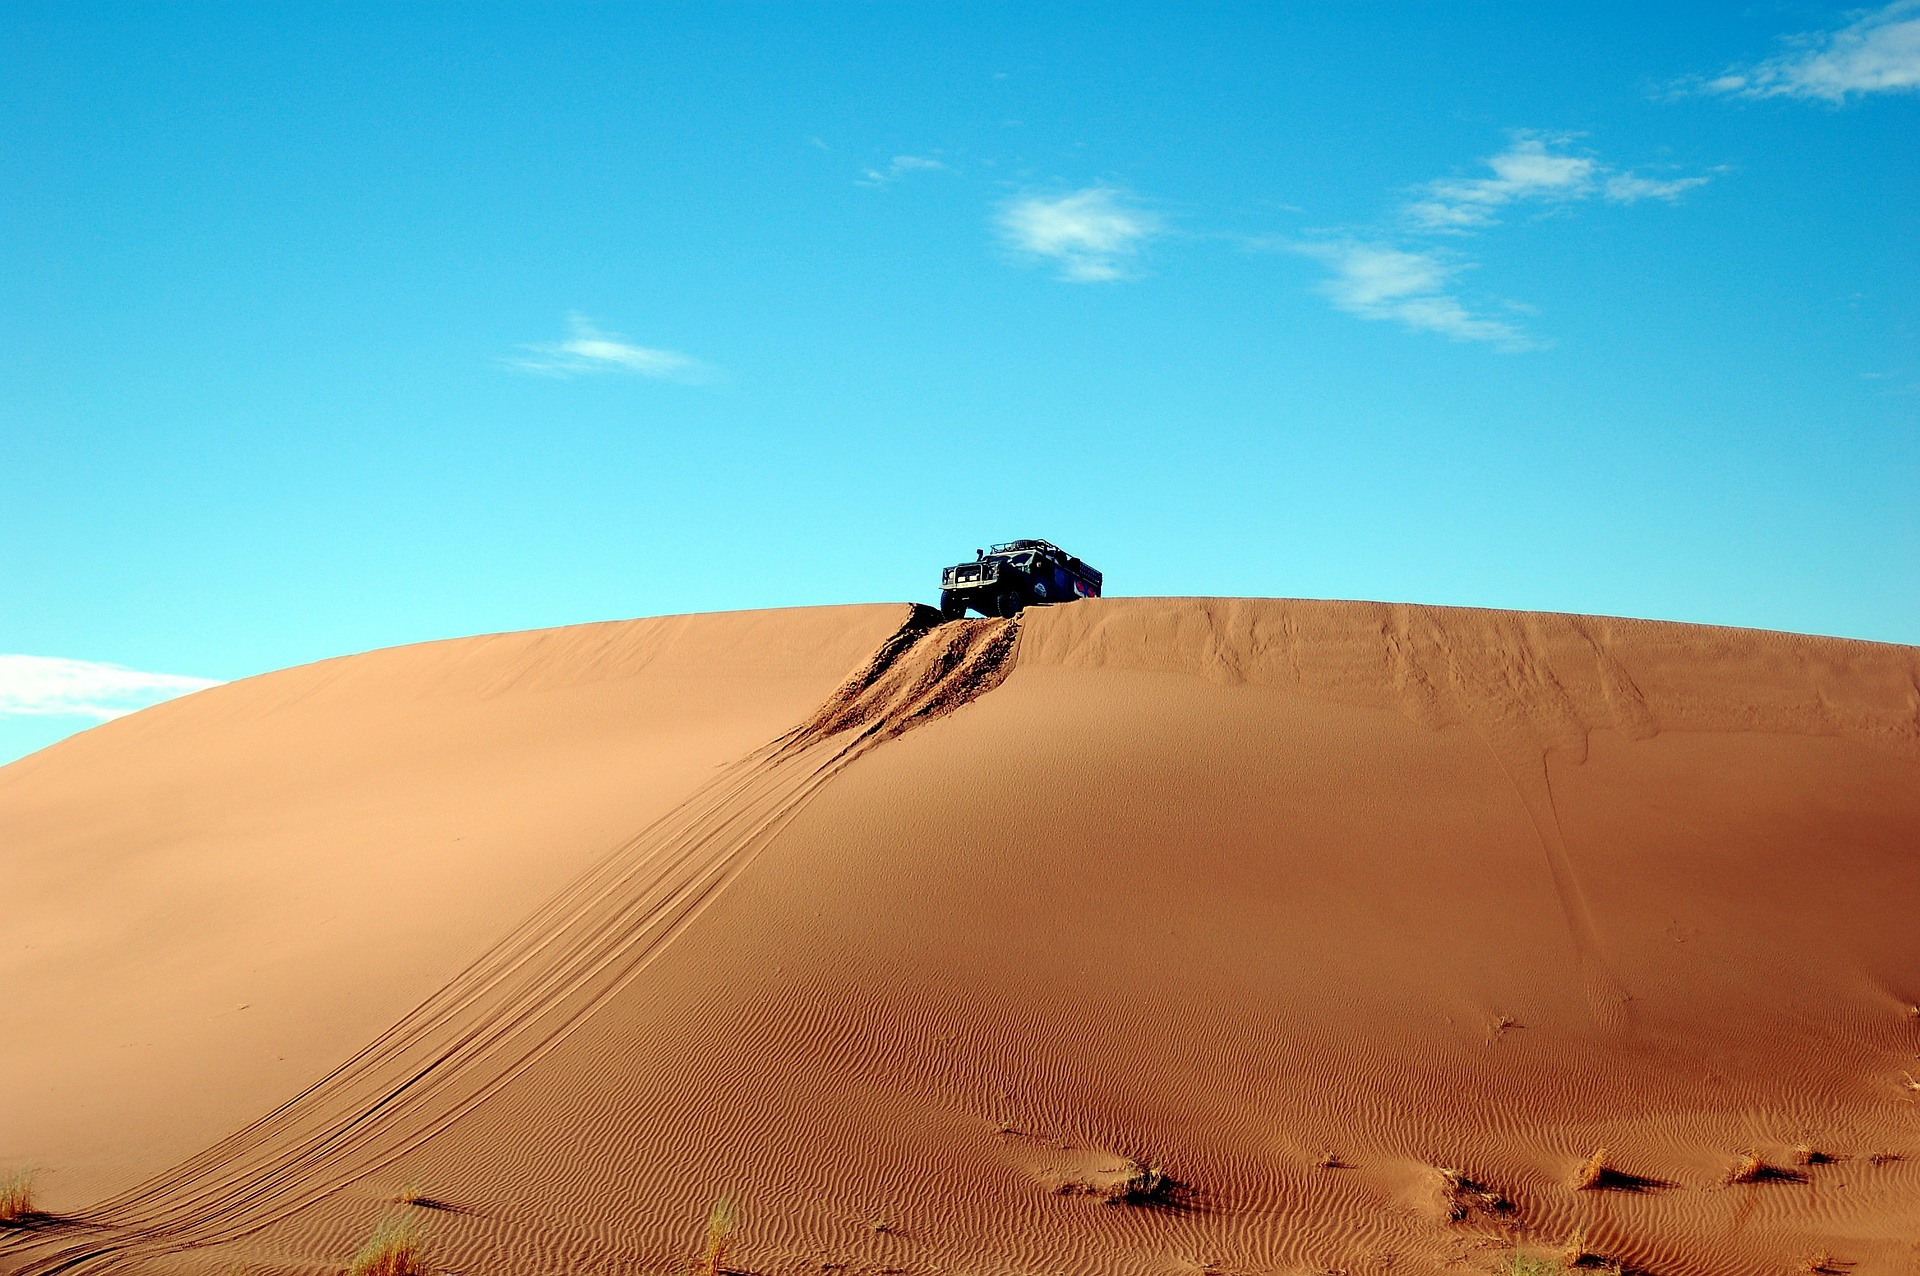 Wüste, Düne, Autos, Sand, Himmel, Risiko, Blau - Wallpaper HD - Prof.-falken.com